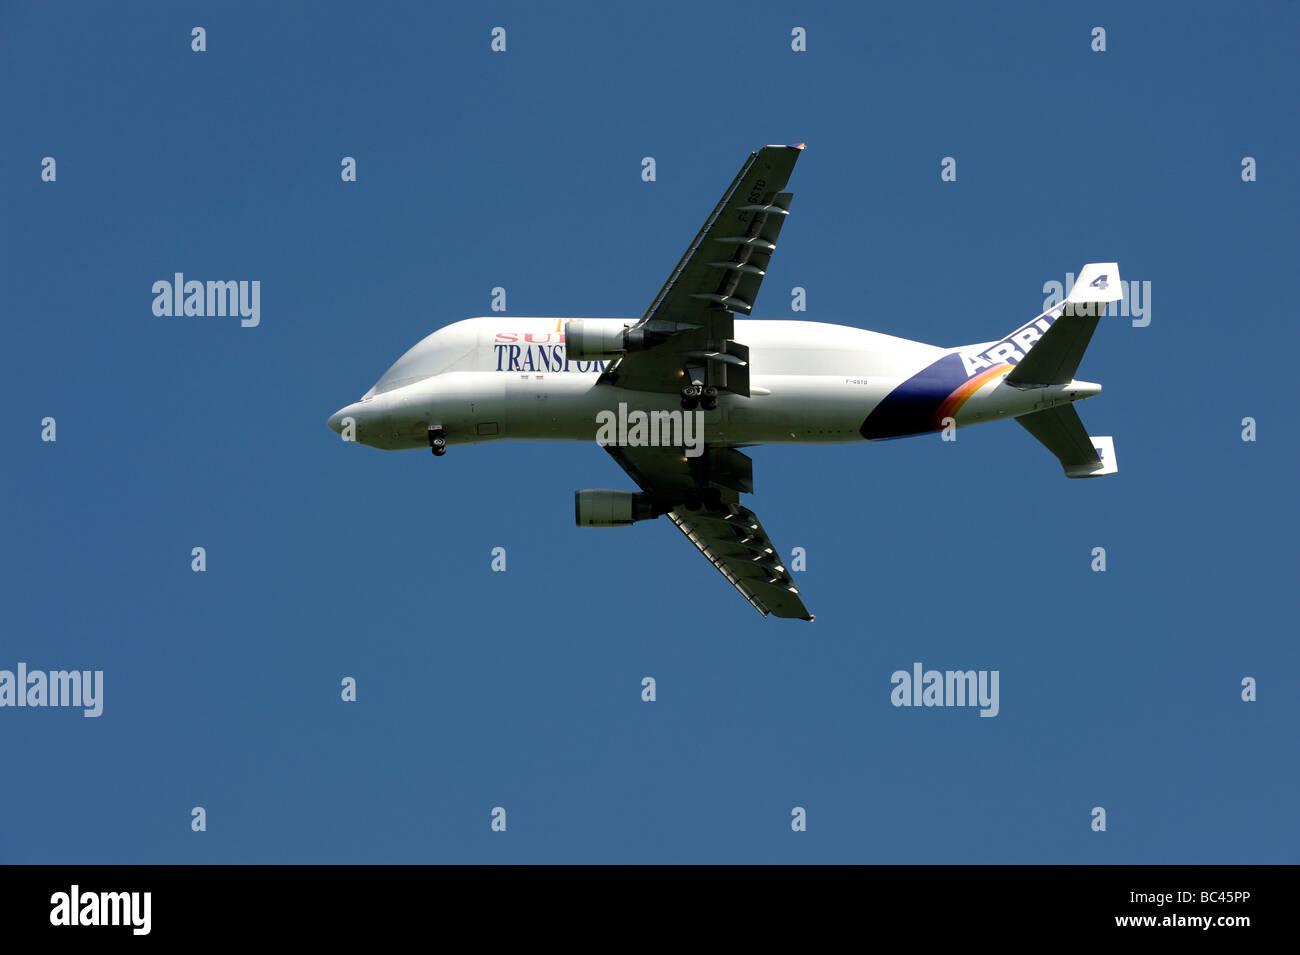 Avion de transport Airbus Beluga Photo Stock